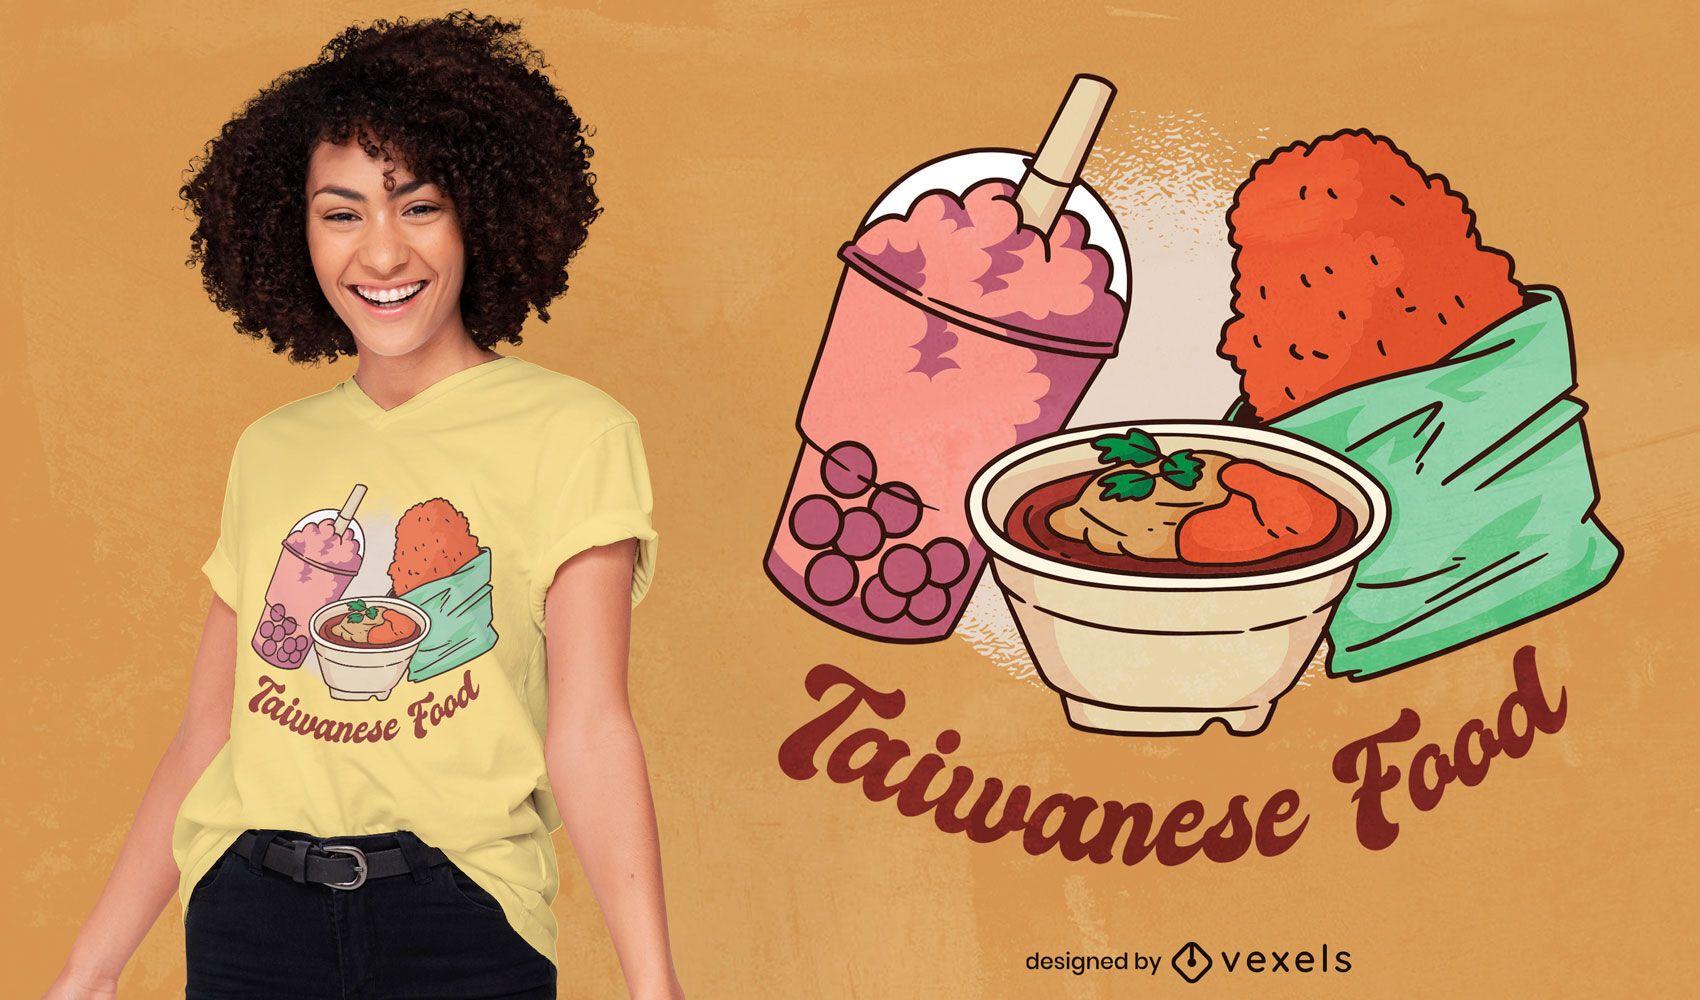 Taiwanese Asian food t-shirt design